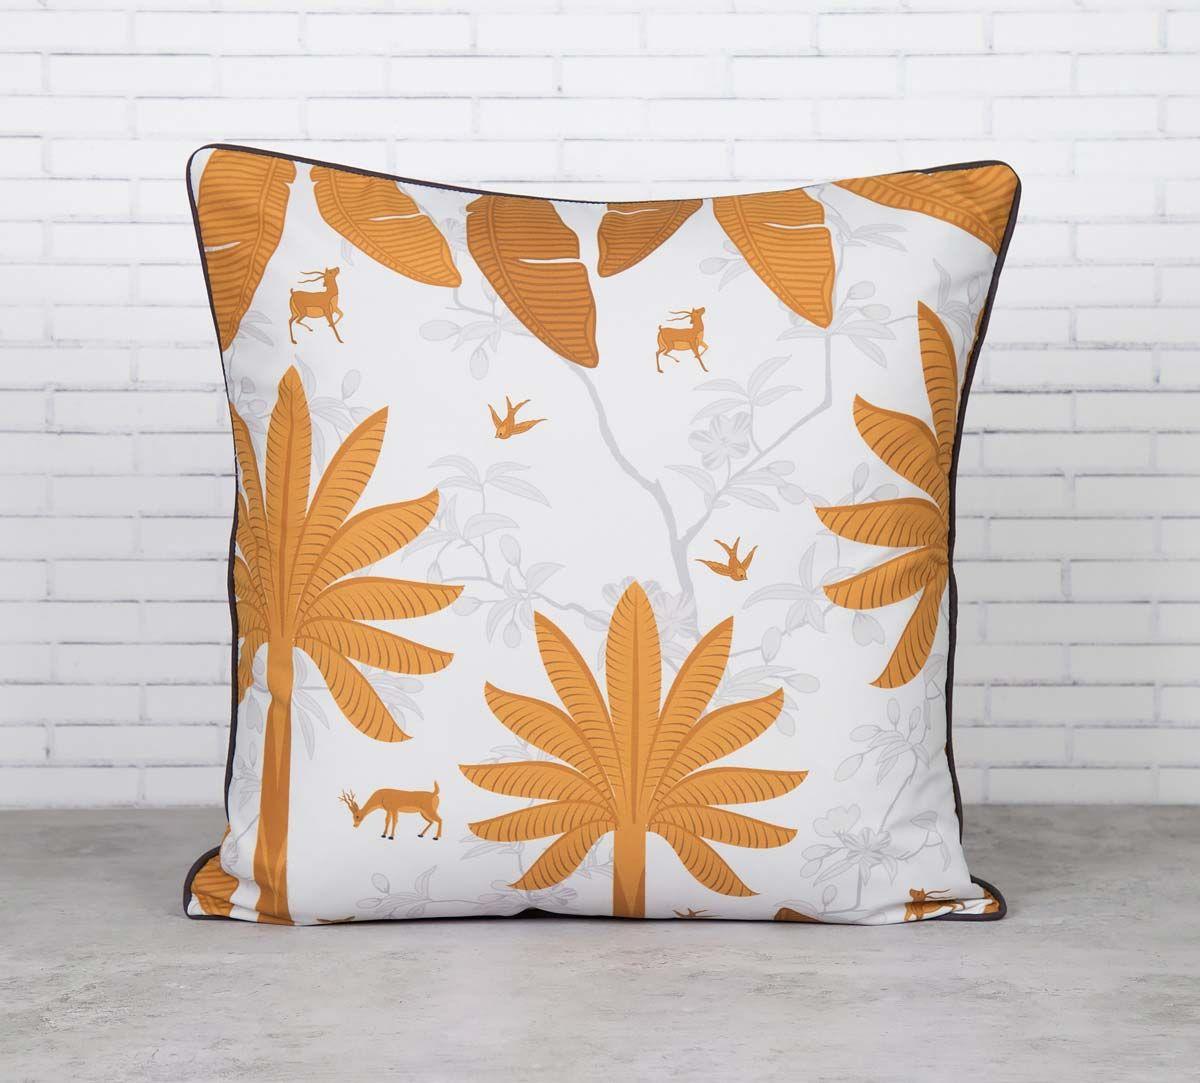 Brooding Woodlot Satin Blend Cushion Cover